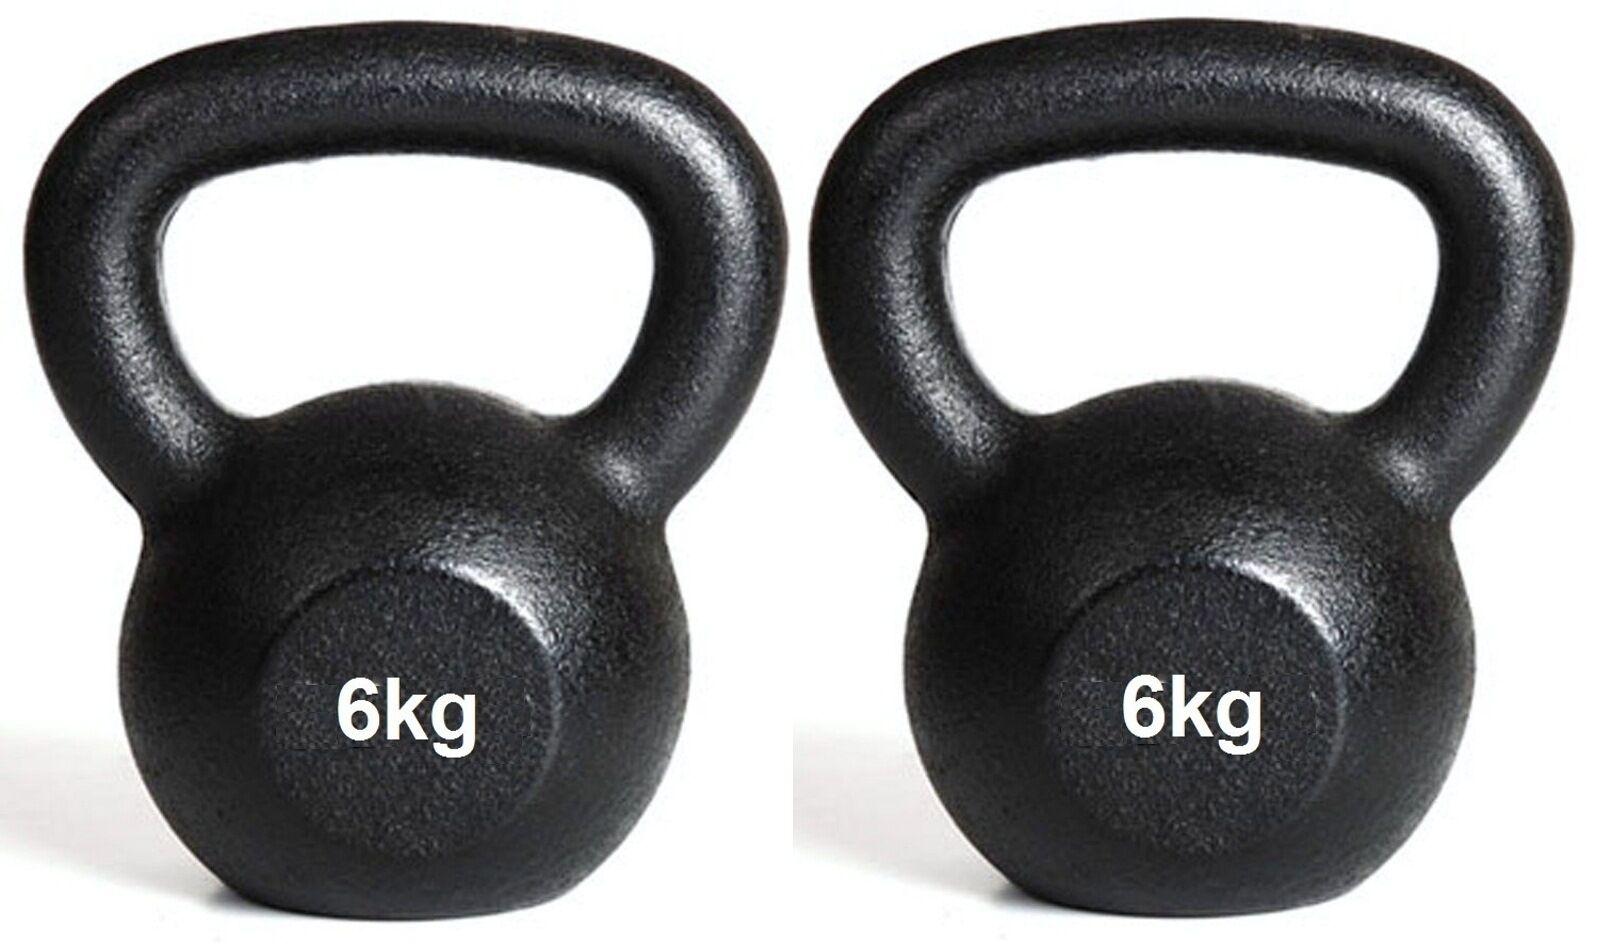 Kugelhantel Gusseisen Wasserkessel Klingel To 4kg To Klingel 50kg Fitnesstraining 61a4b7